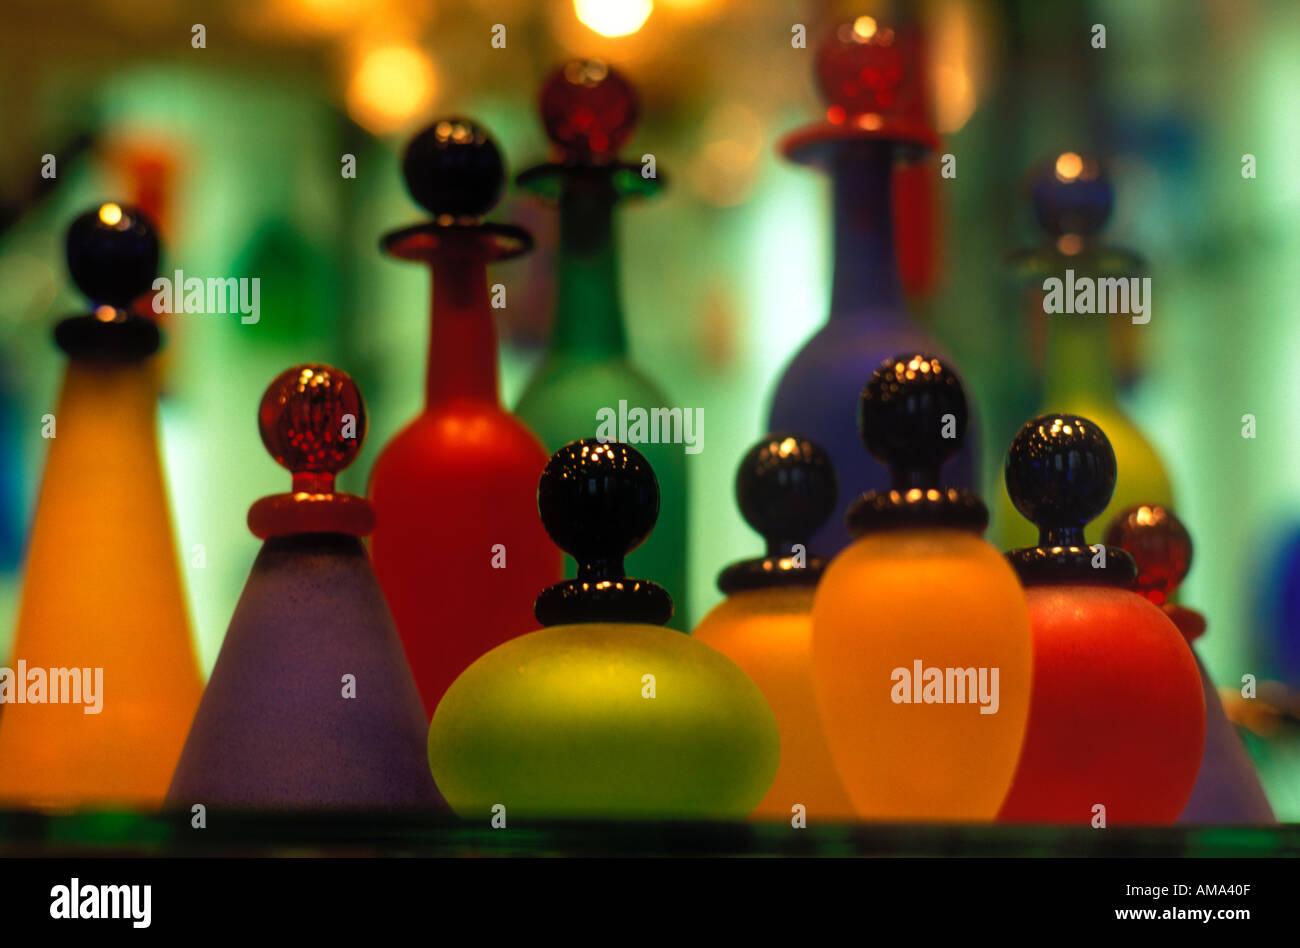 Italy Venice Venetian glass bottles in bright colors - Stock Image